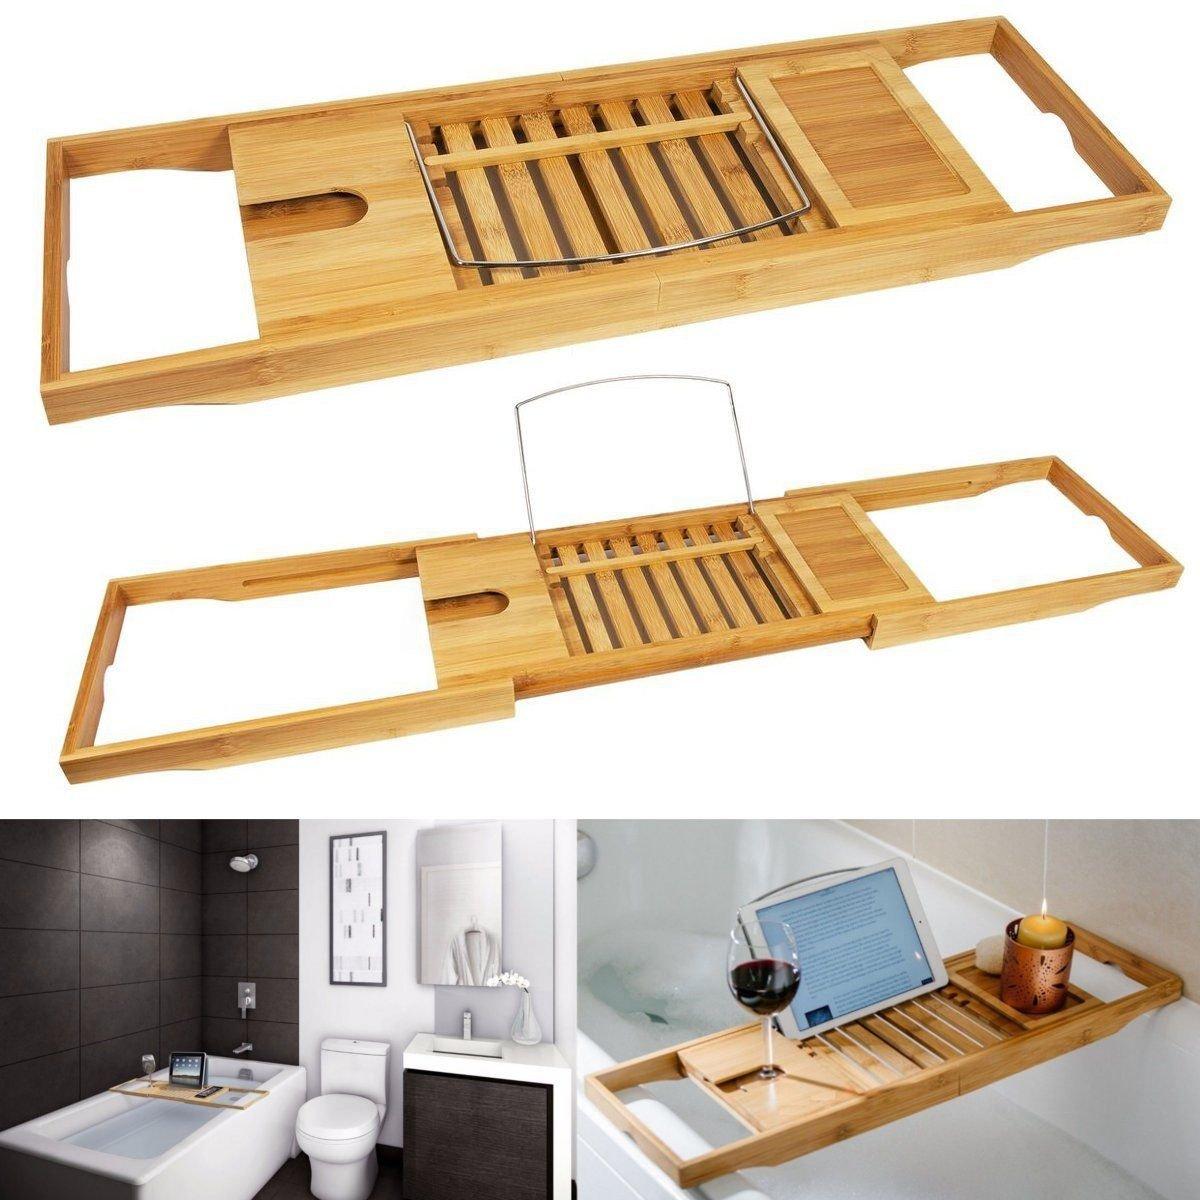 Amazon.com: Bamboo Bathtub Rack Shelf Caddy Tray Wine Holder Book ...